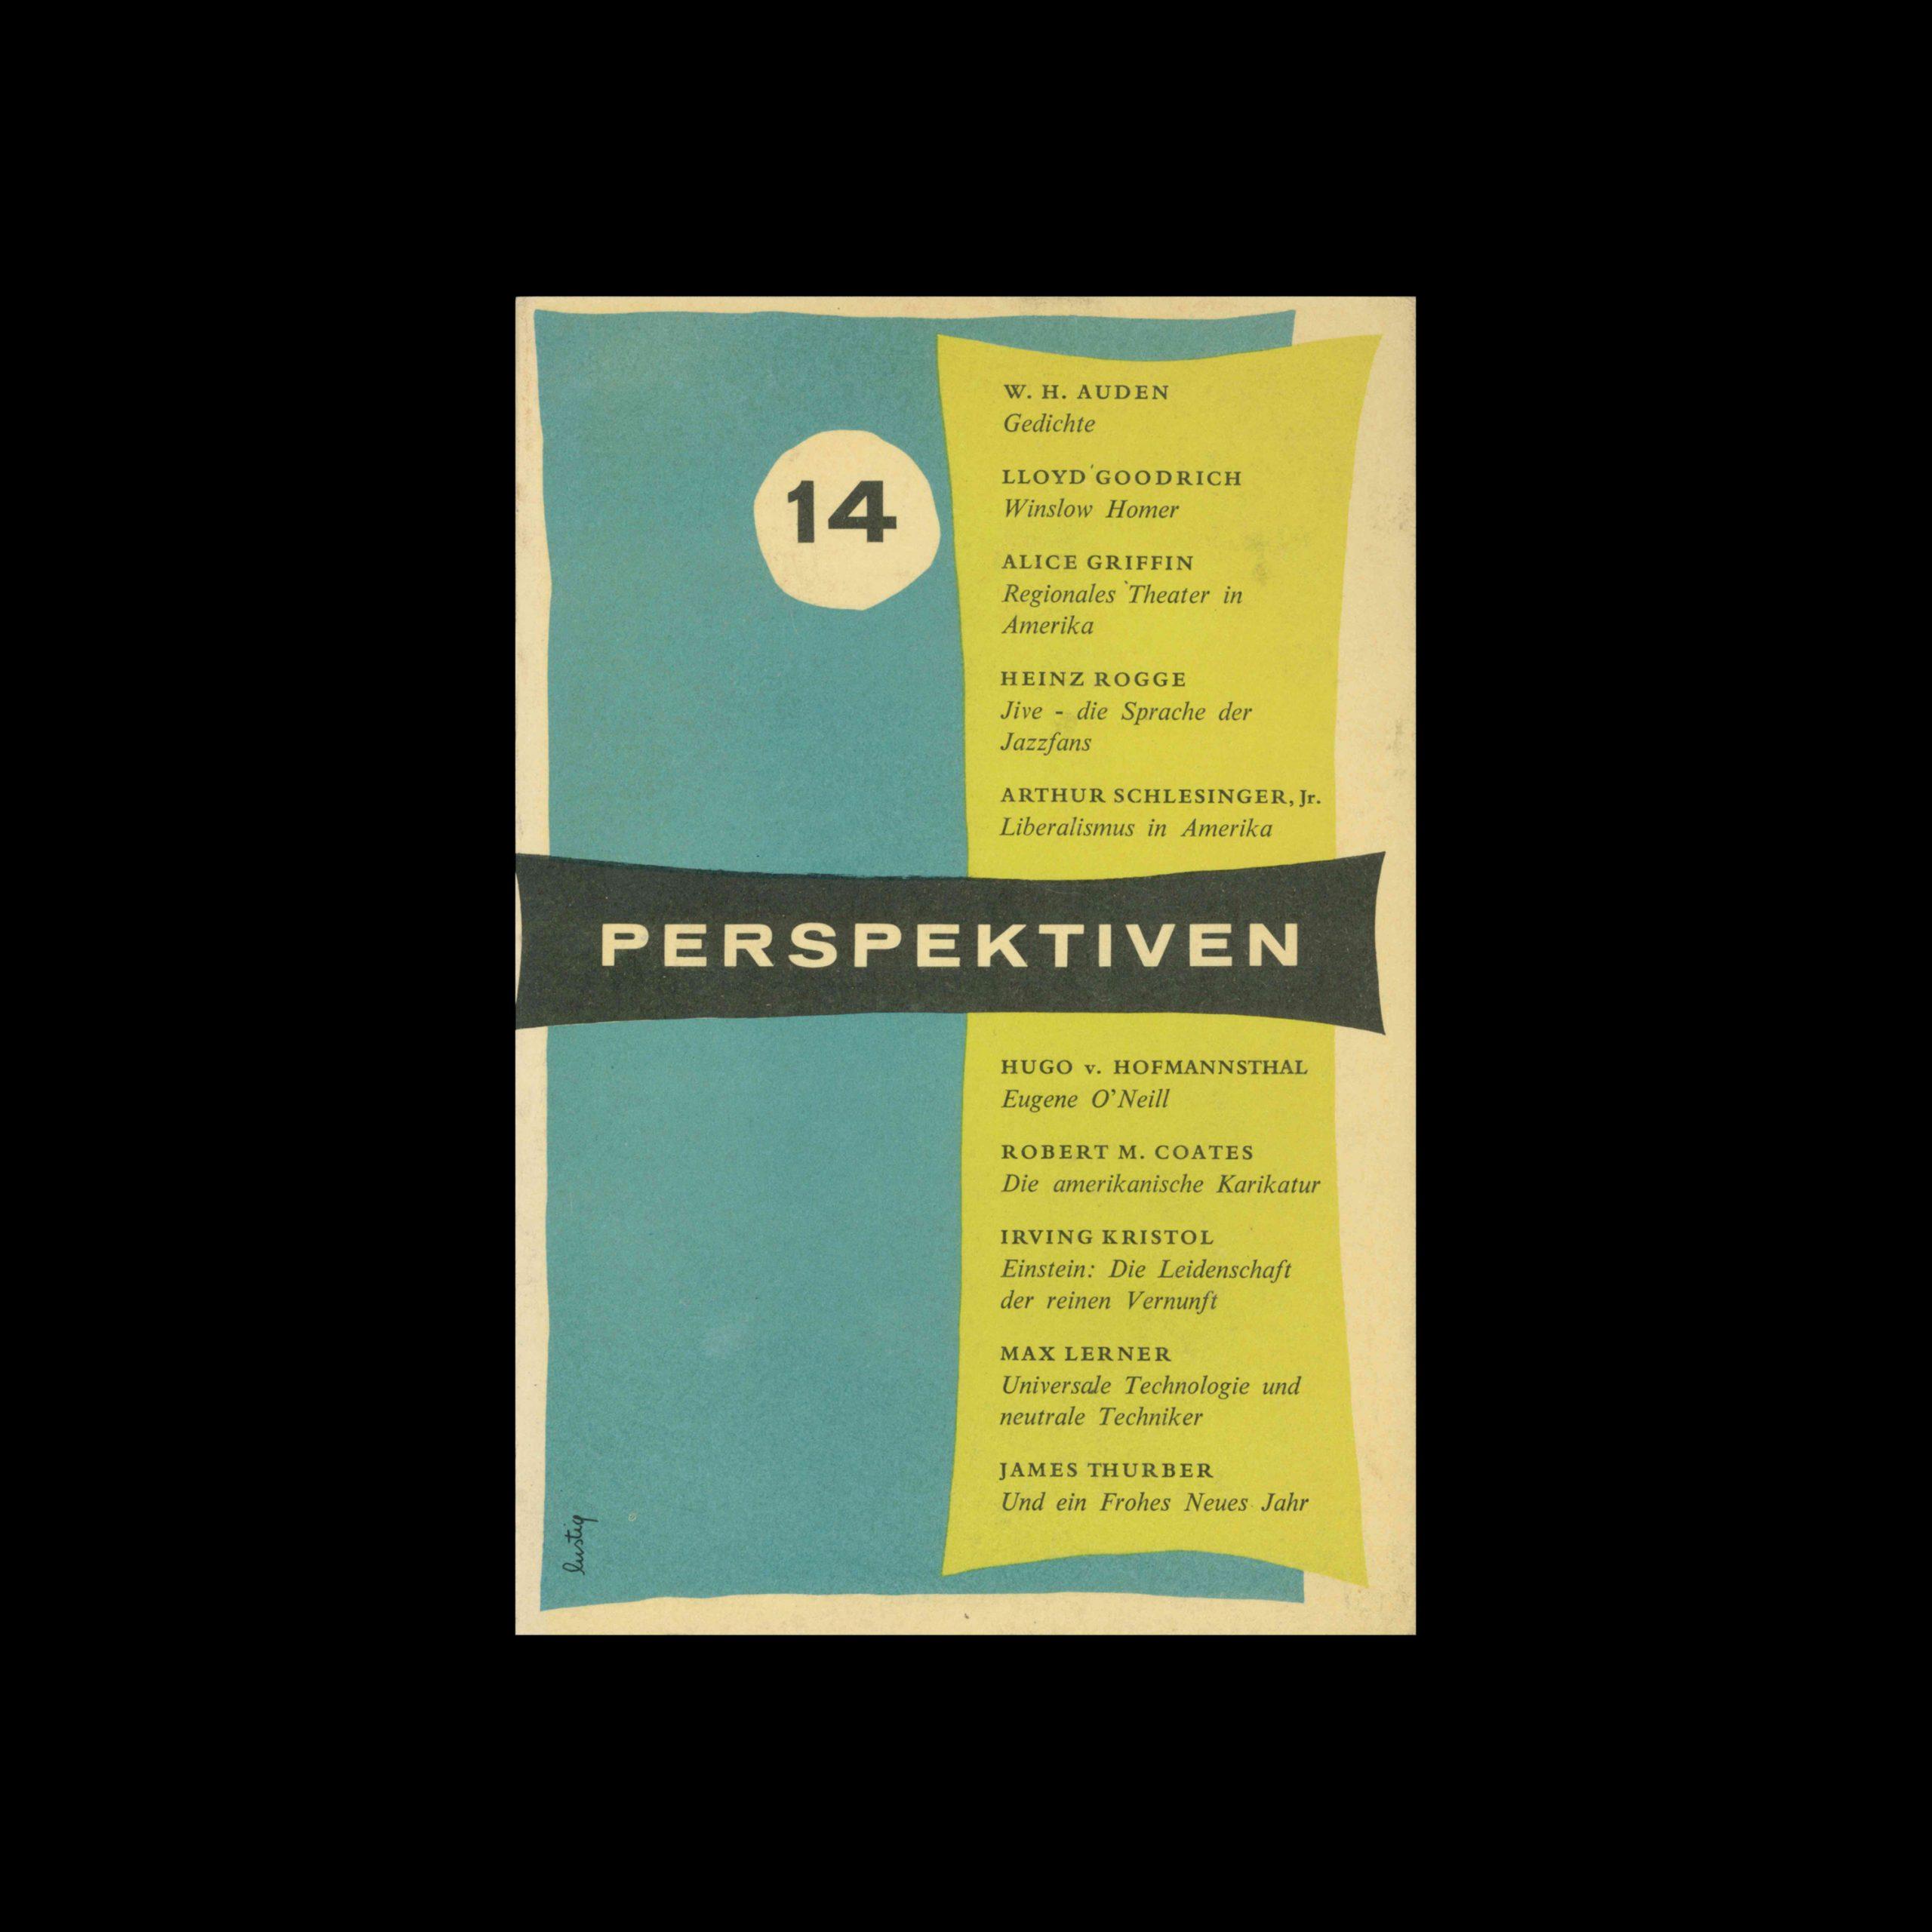 Perspektiven, Literatur, Kunst, Musik, 14, 1956. Cover design by Alvin Lustig